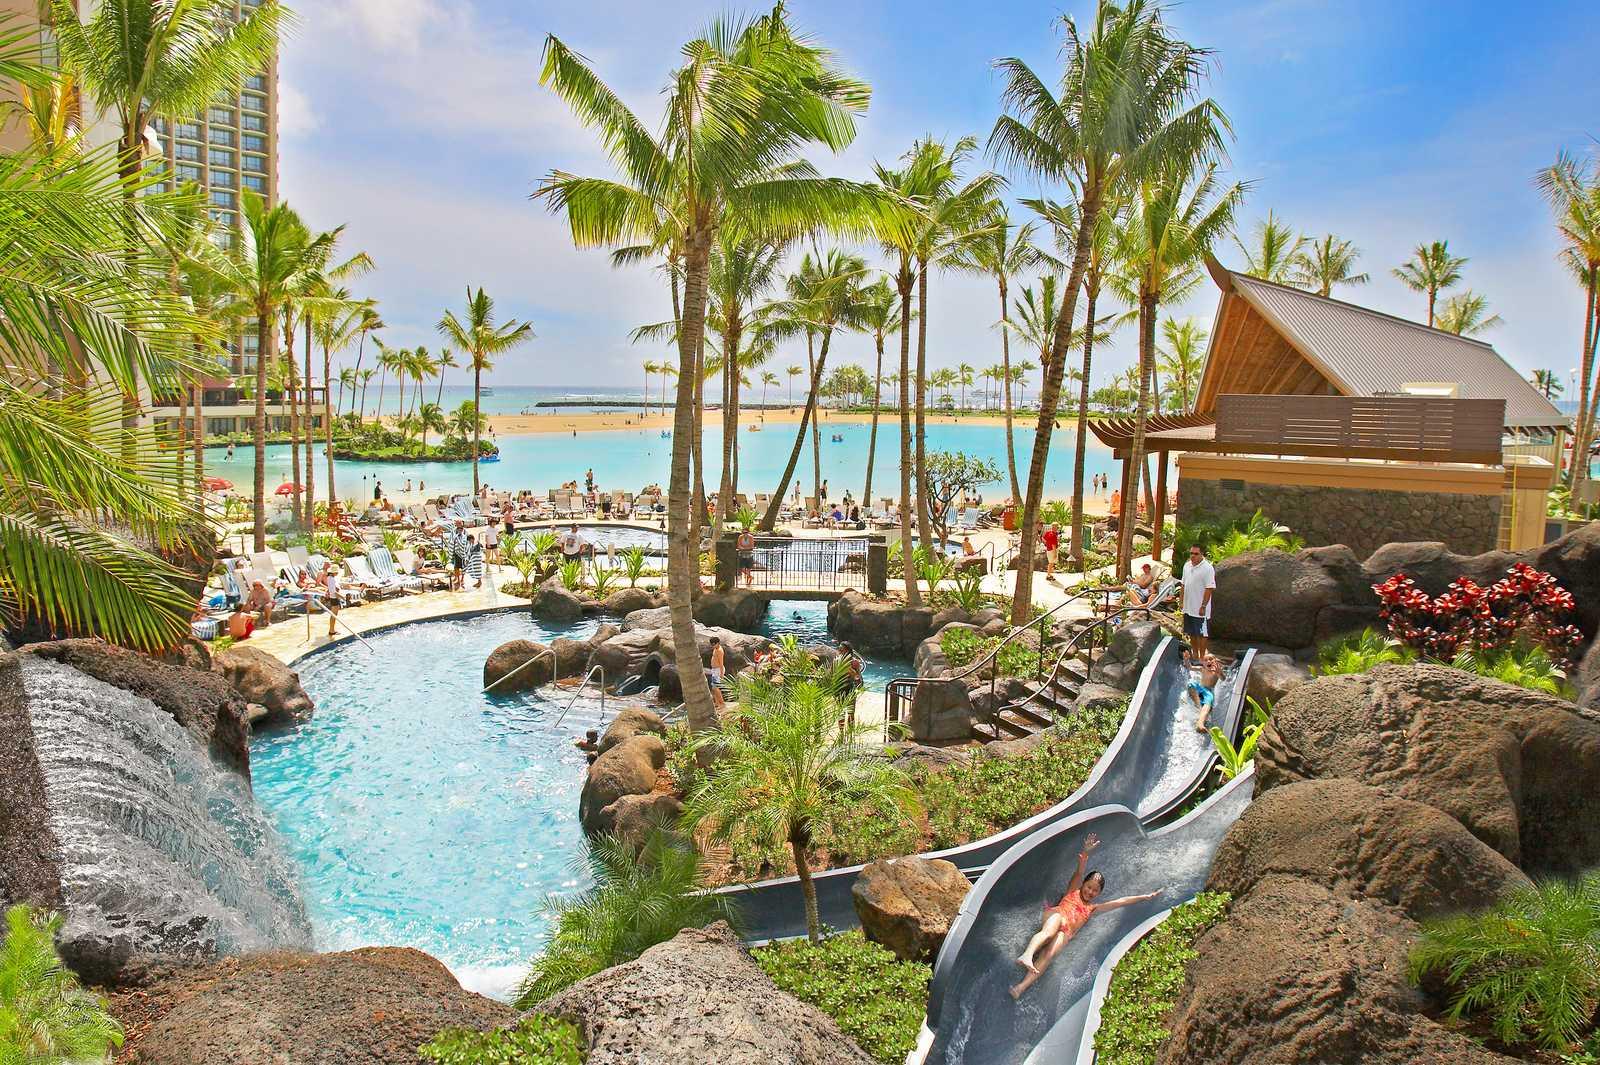 Pool am Hilton Hawaiian Village auf Oahu